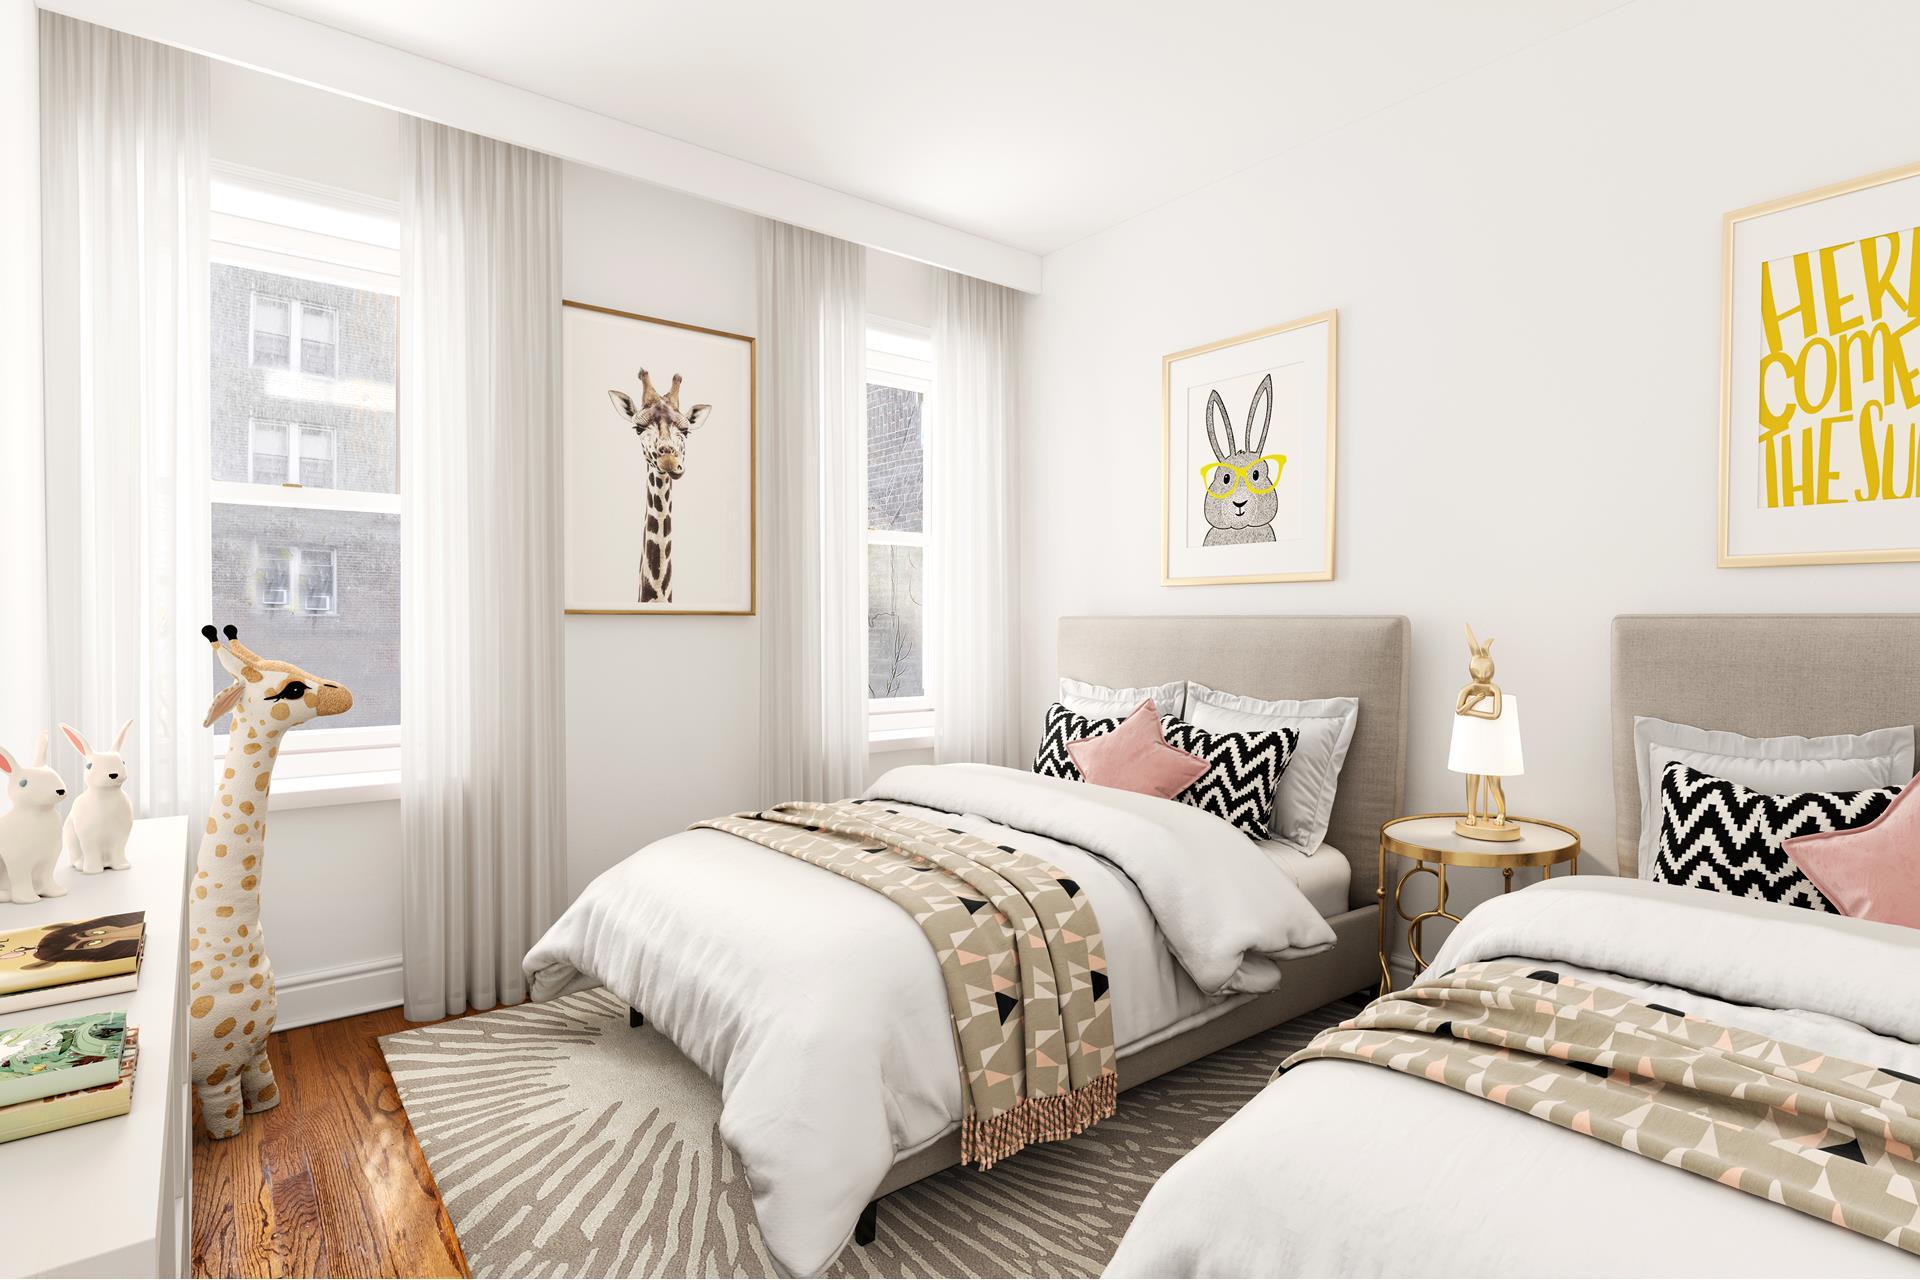 48-50 44th Street Sunnyside Queens NY 11377